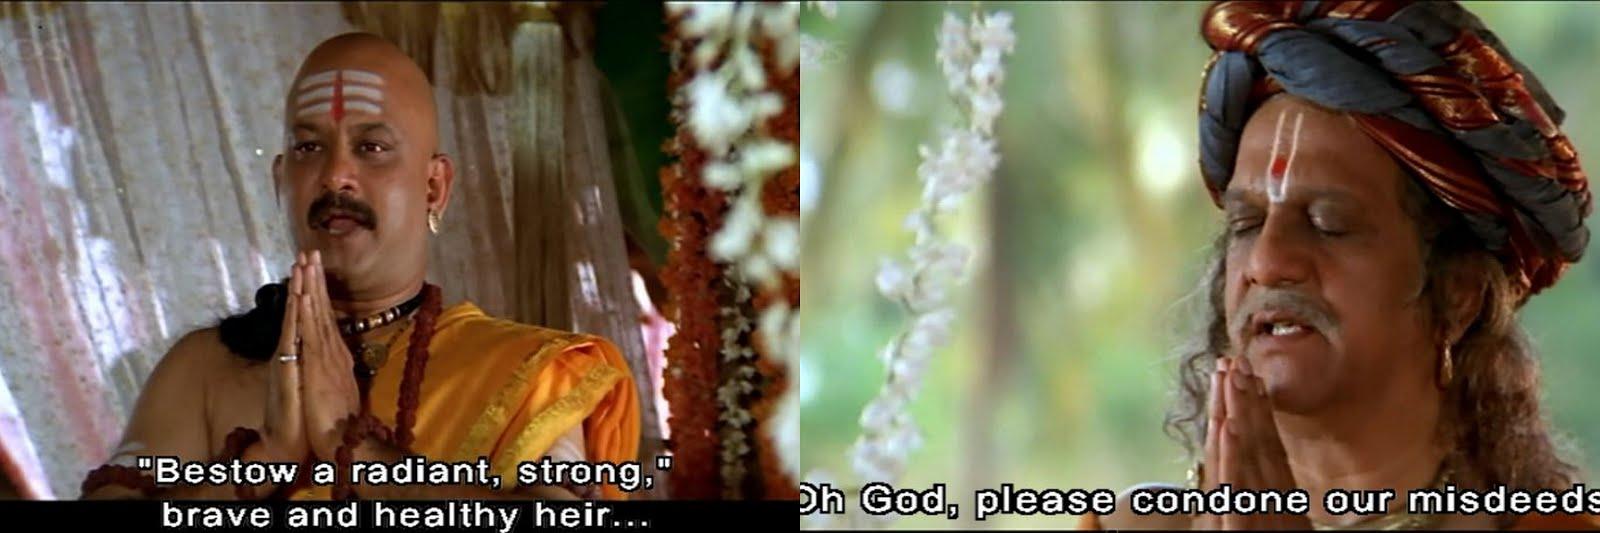 Shrirang godbole wife sexual dysfunction